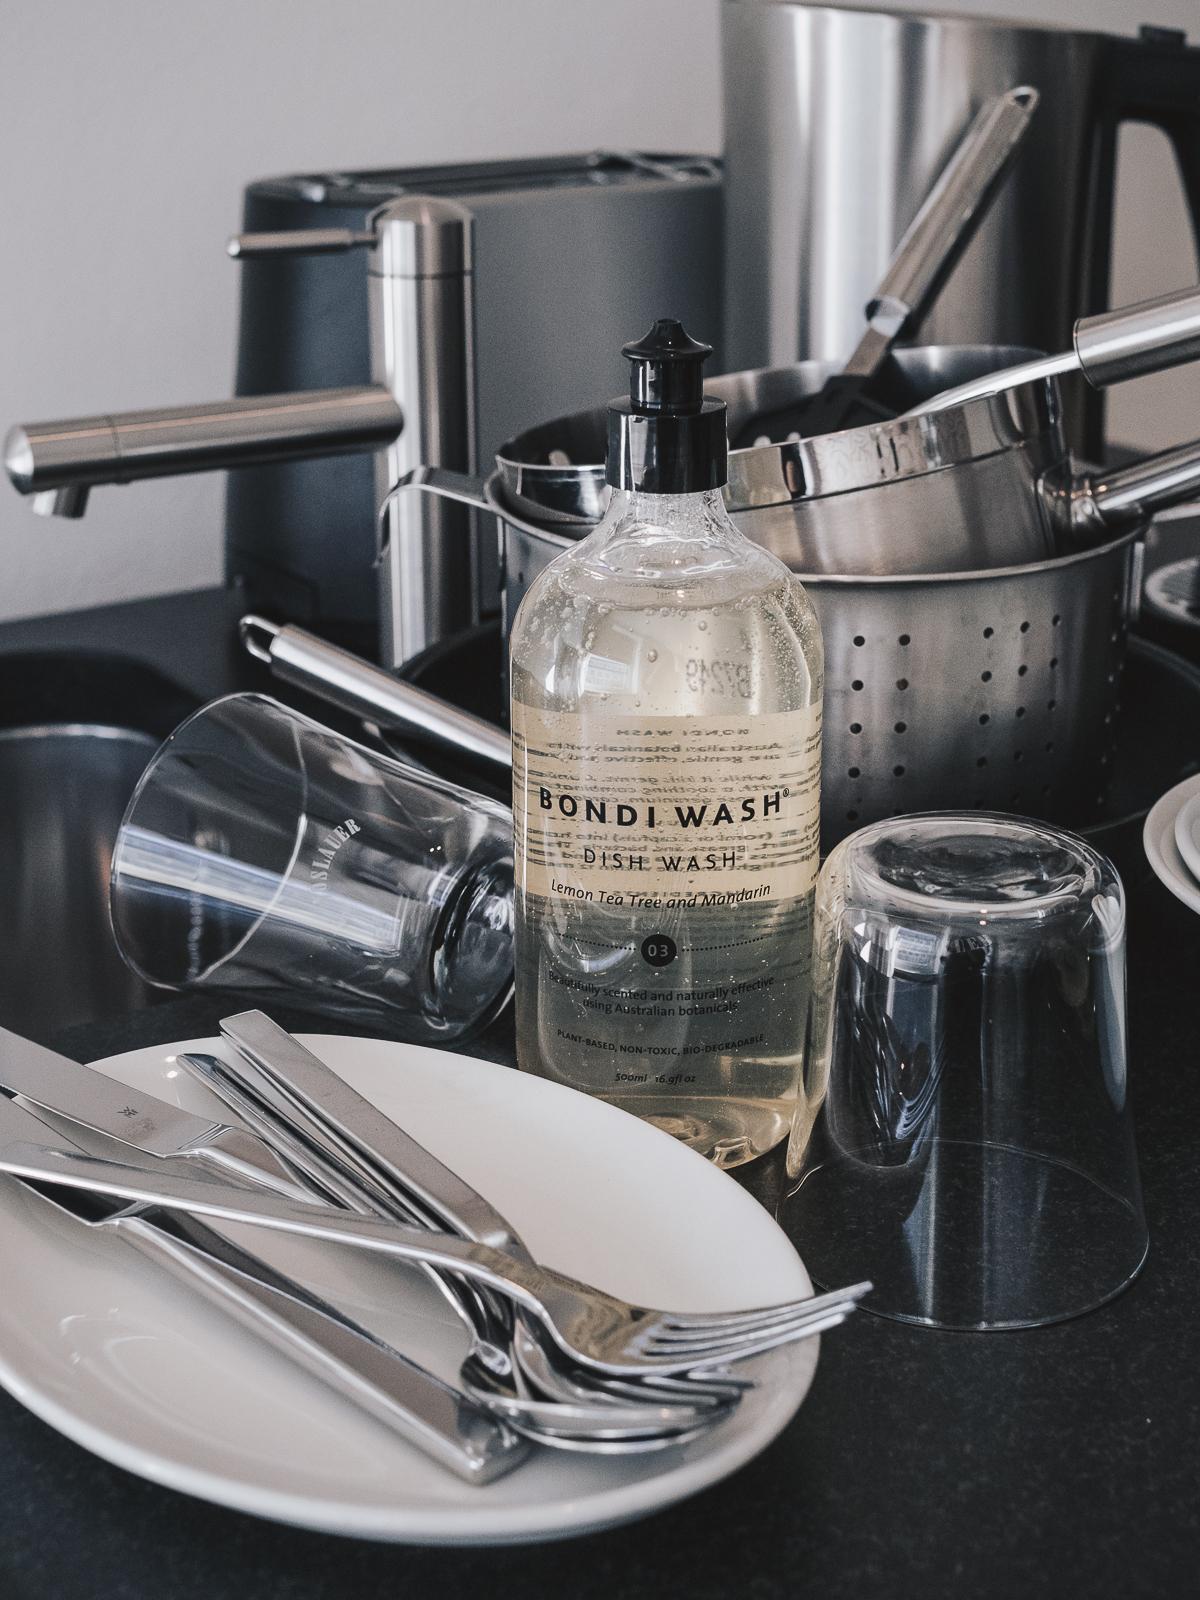 BONDI WASH檸檬茶樹 & 柑橘碗盤清潔液 - Dish Wash Lemon Tea Tree & Mandarin